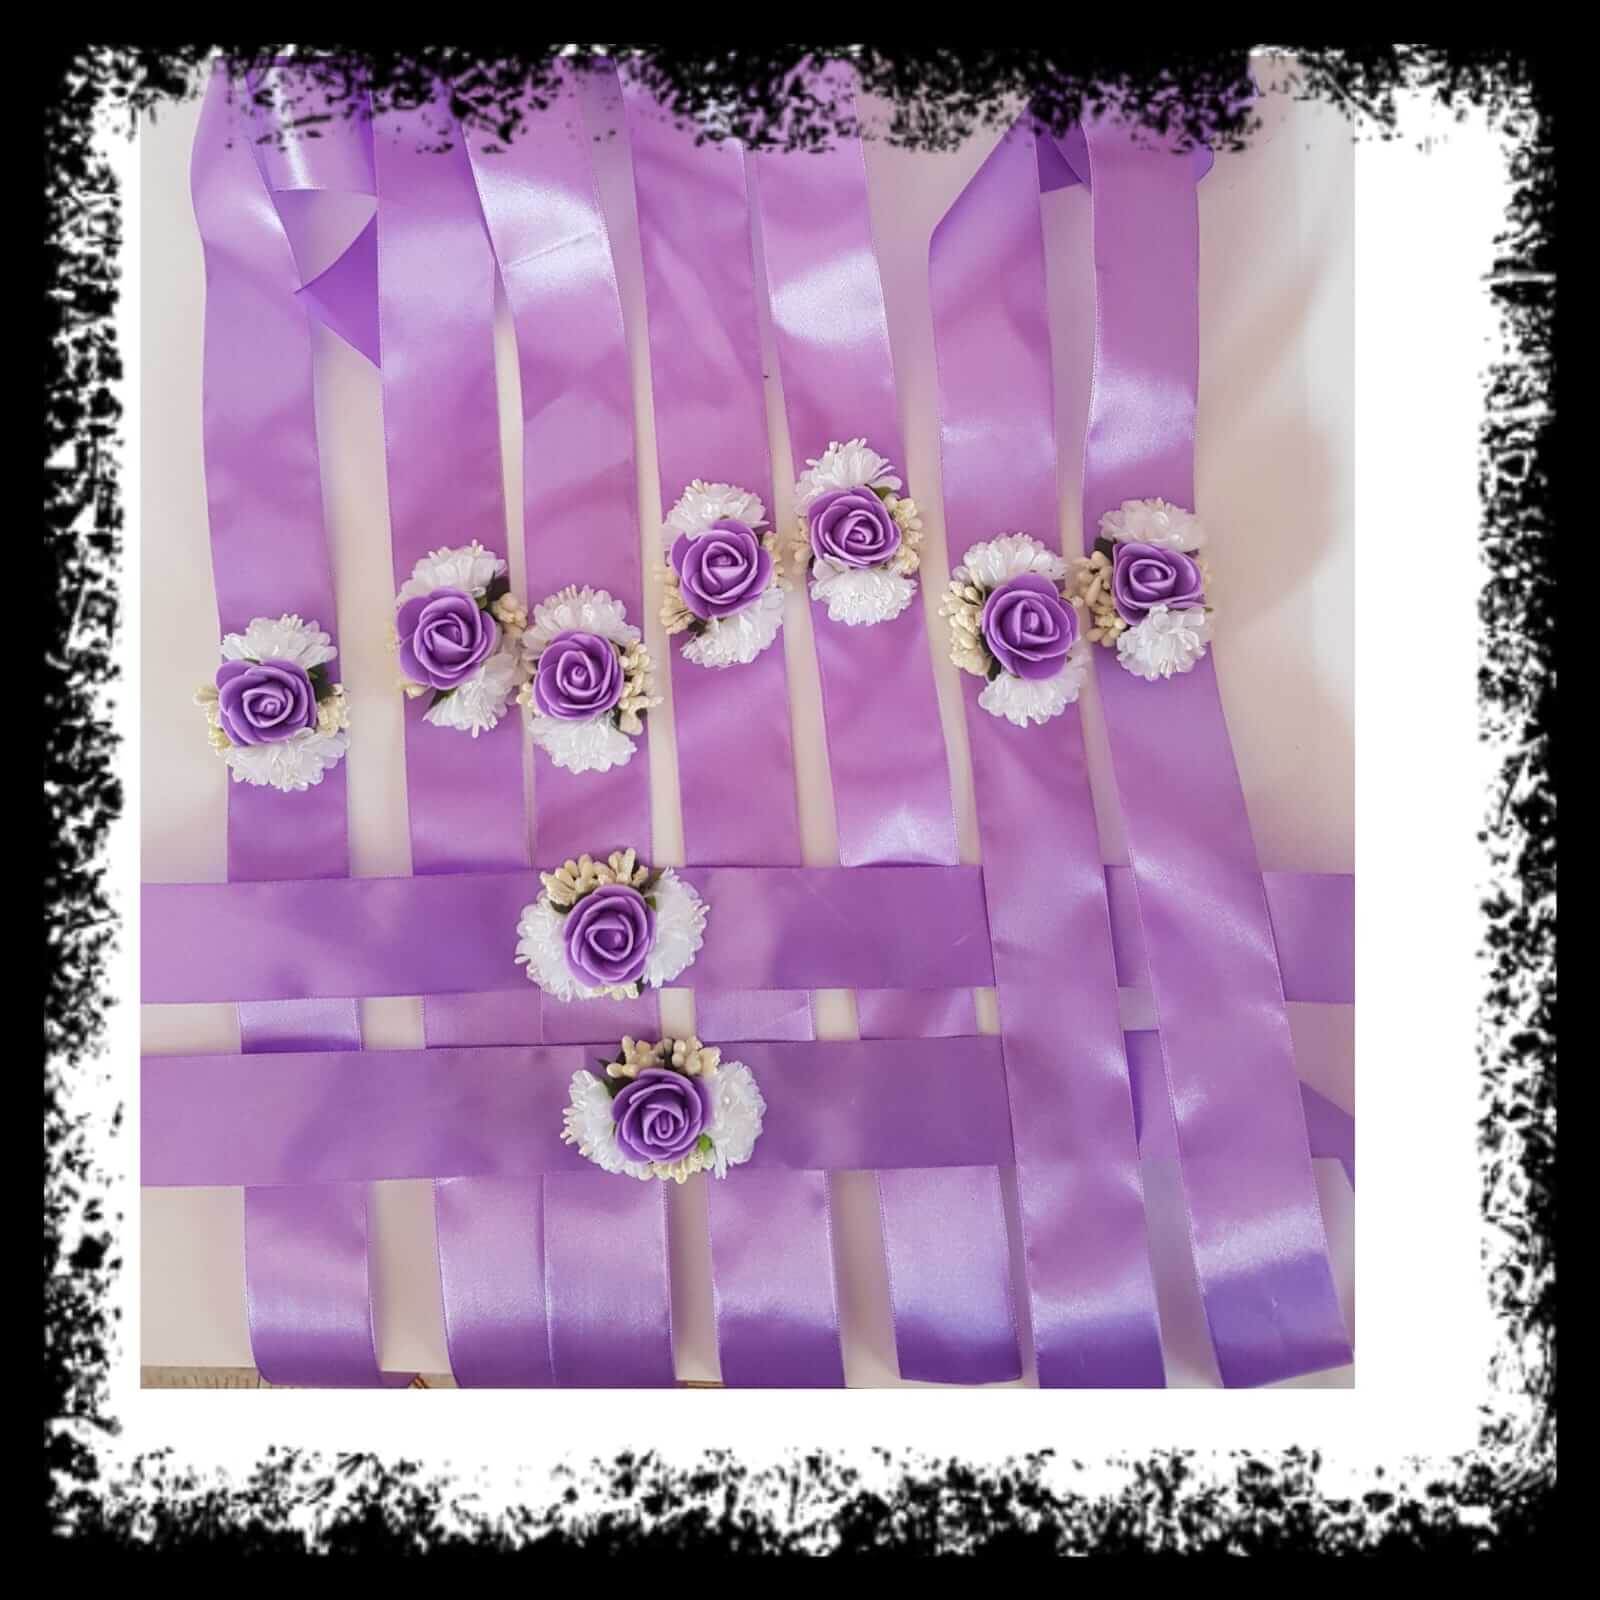 pulseras damas de honor pulseras damas de honor - pulseras damas de honor detalles para boda 1 - Pulseras damas de honor